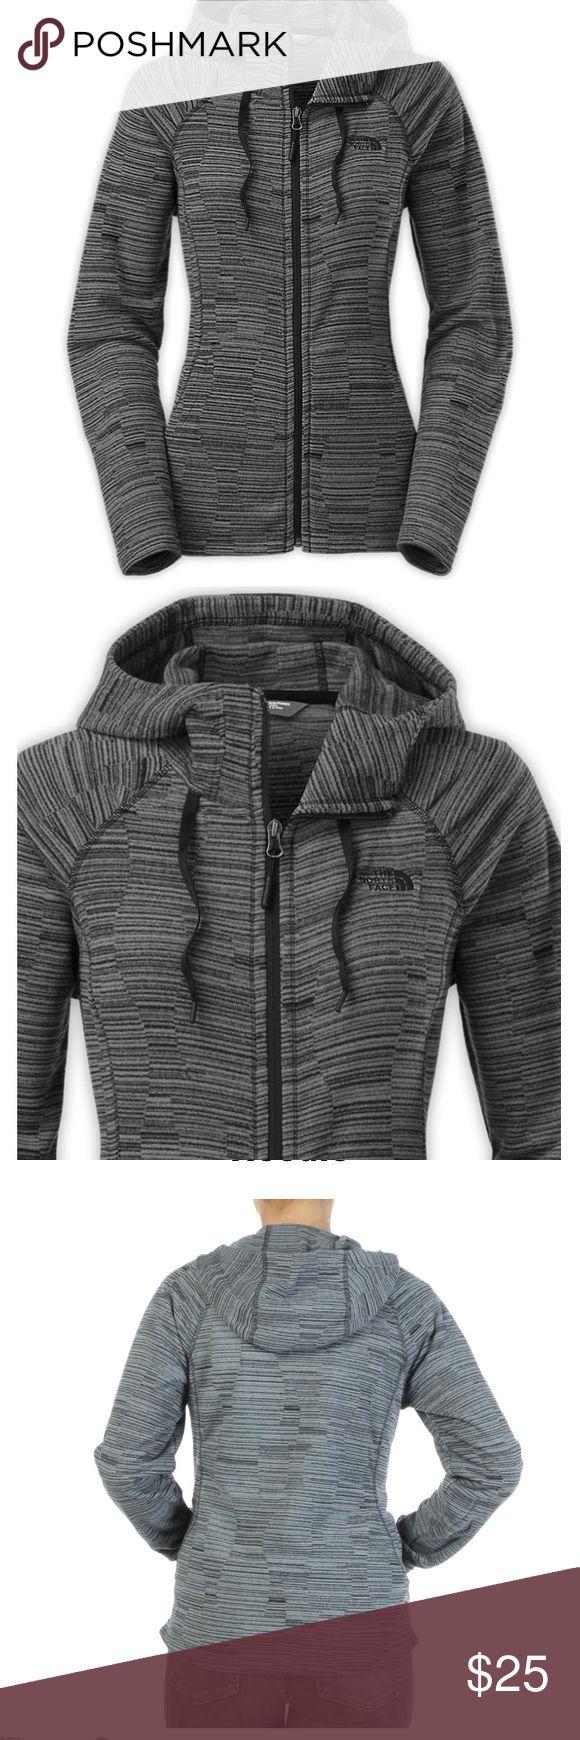 17 Best ideas about North Face Fleece Jacket on Pinterest | Black ...